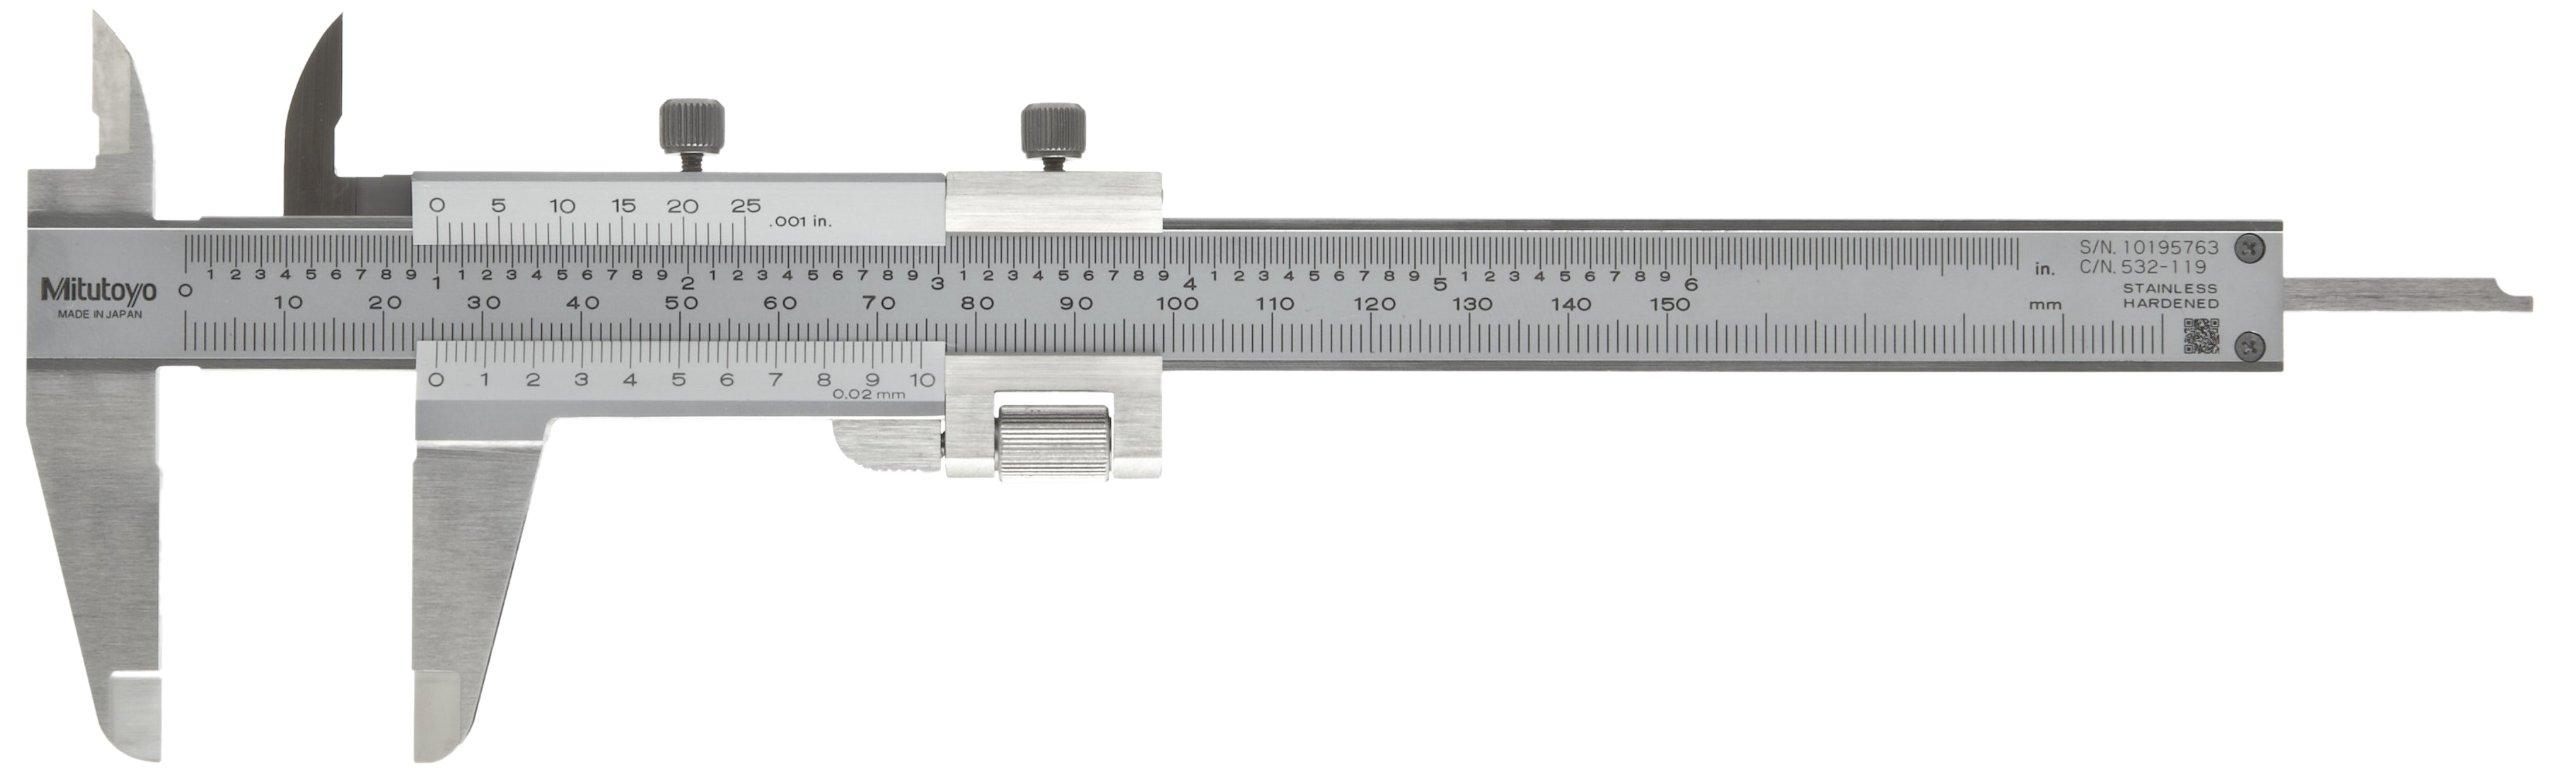 Mitutoyo 532-119 Vernier Caliper, Stainless Steel, Inch/Metric, 0-5'' Range, +/-0.0011'' Accuracy, 0.001'' Resolution